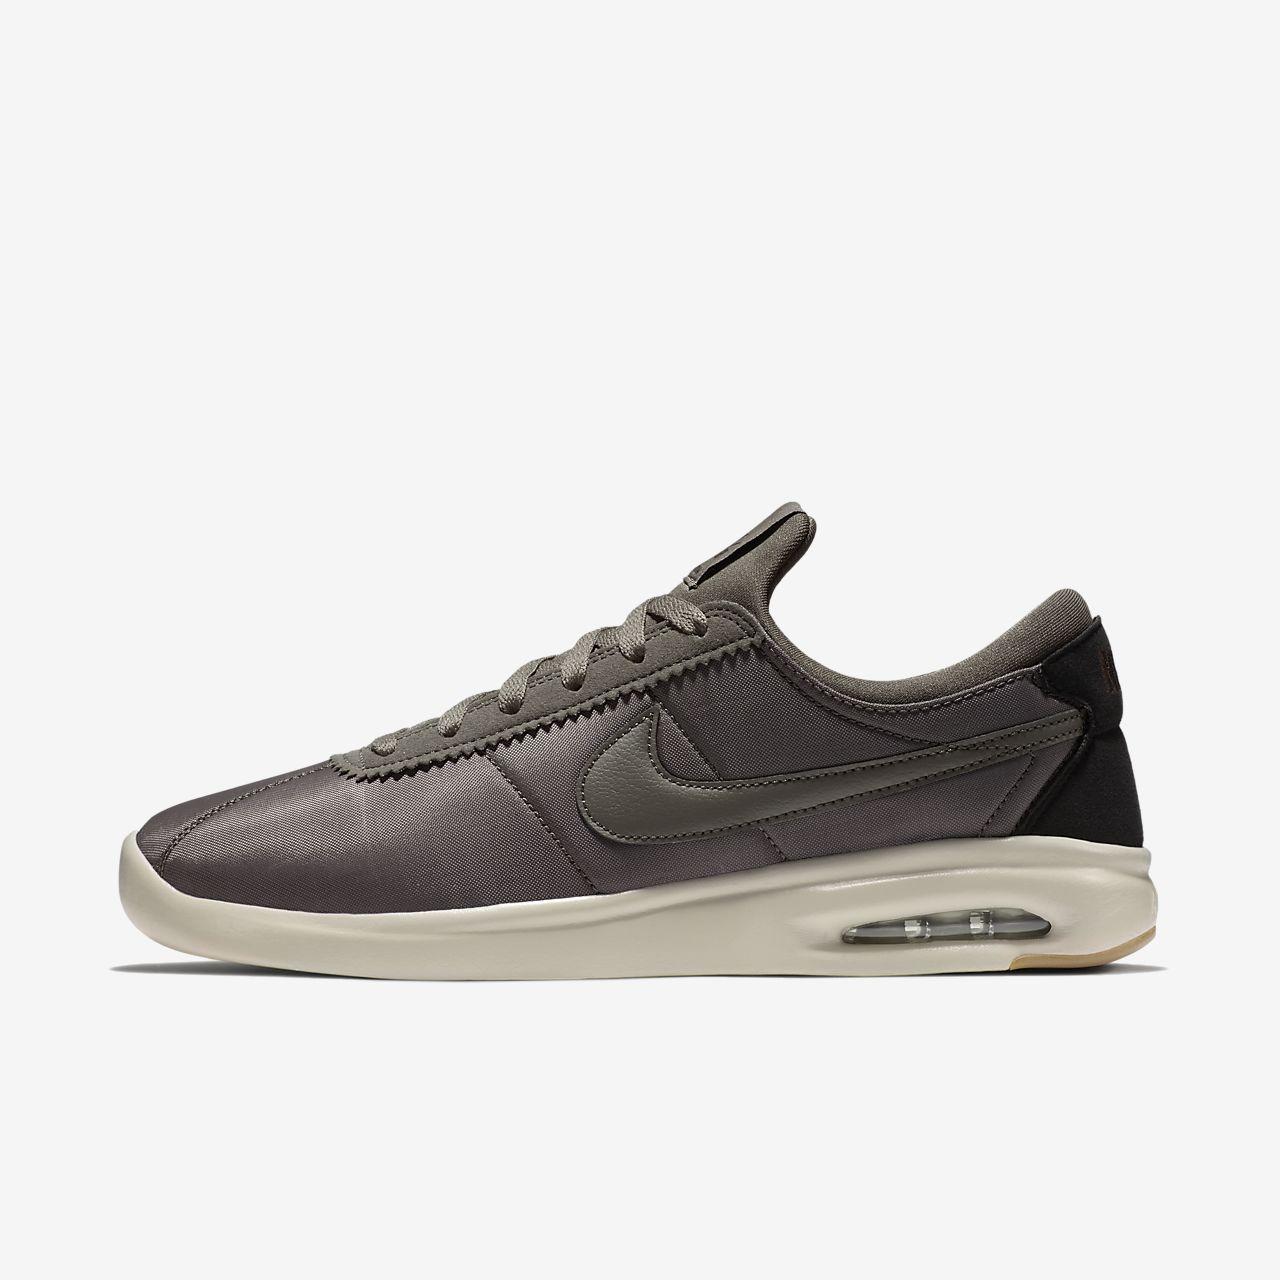 Nike SB Air Max Bruin Vapor Boys Skateboarding Shoes Brown vS7280S